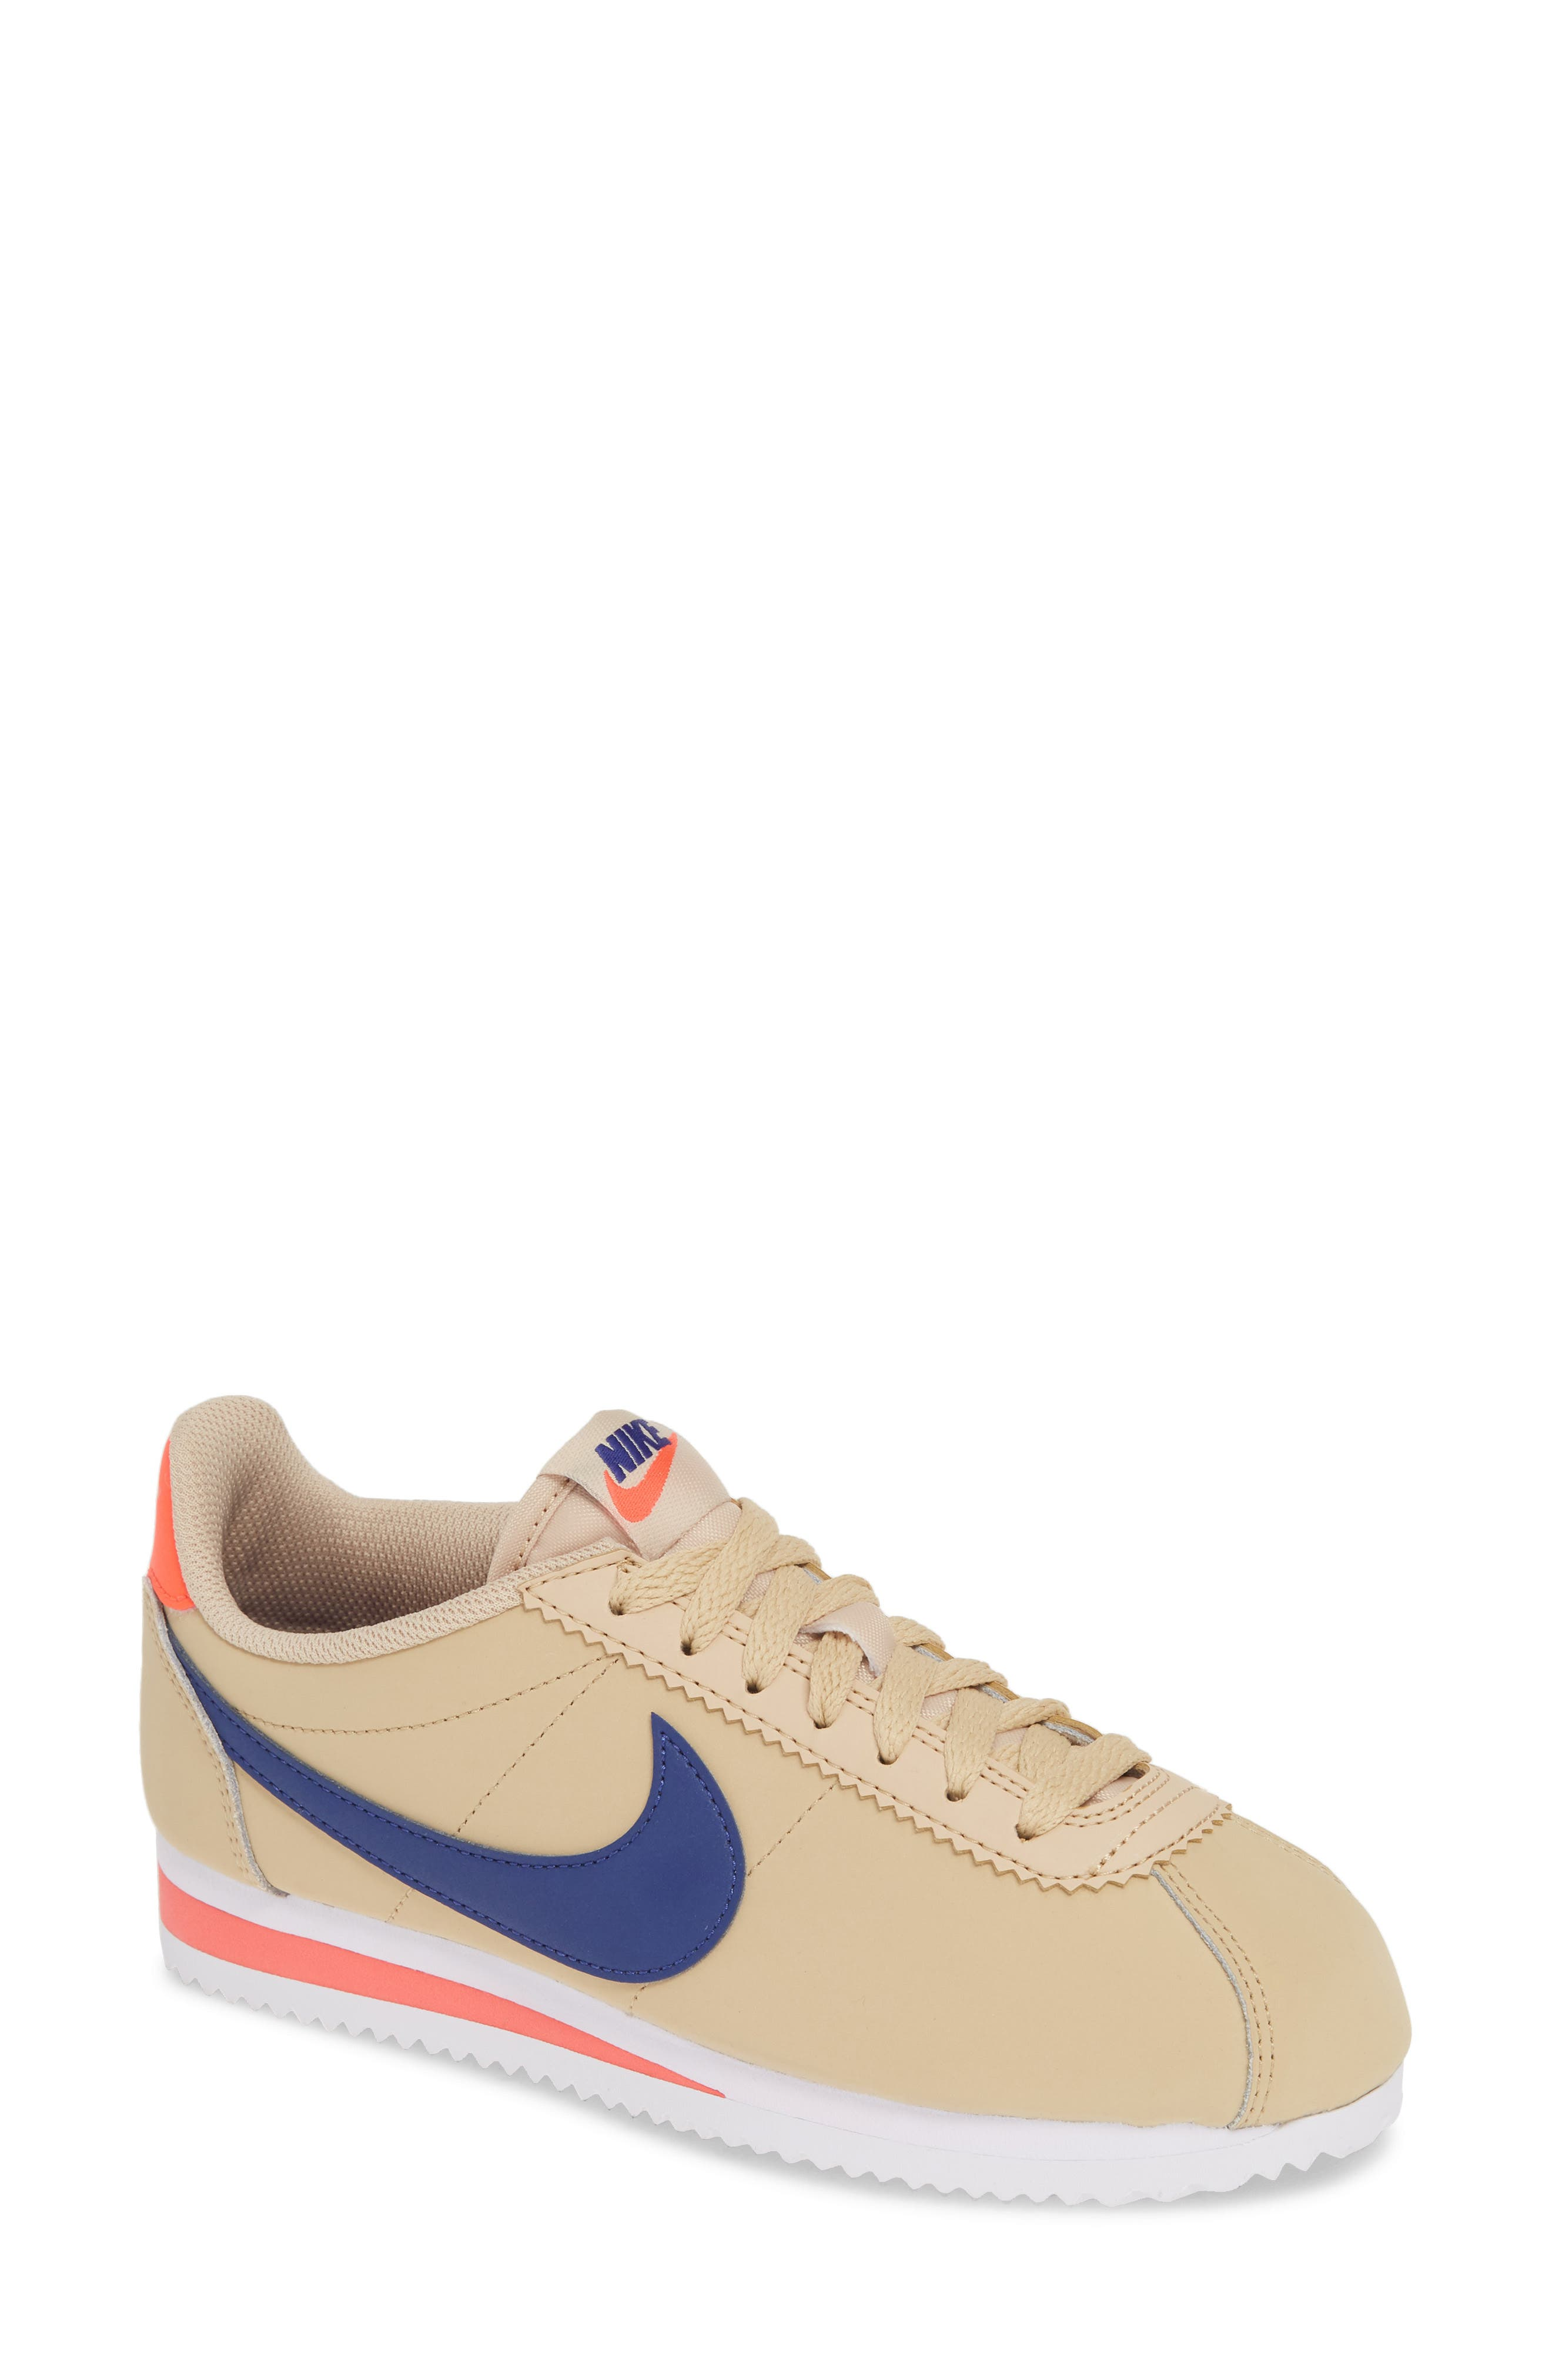 ,                             Classic Cortez Sneaker,                             Main thumbnail 1, color,                             DESERT ORE/ DEEP ROYAL BLUE